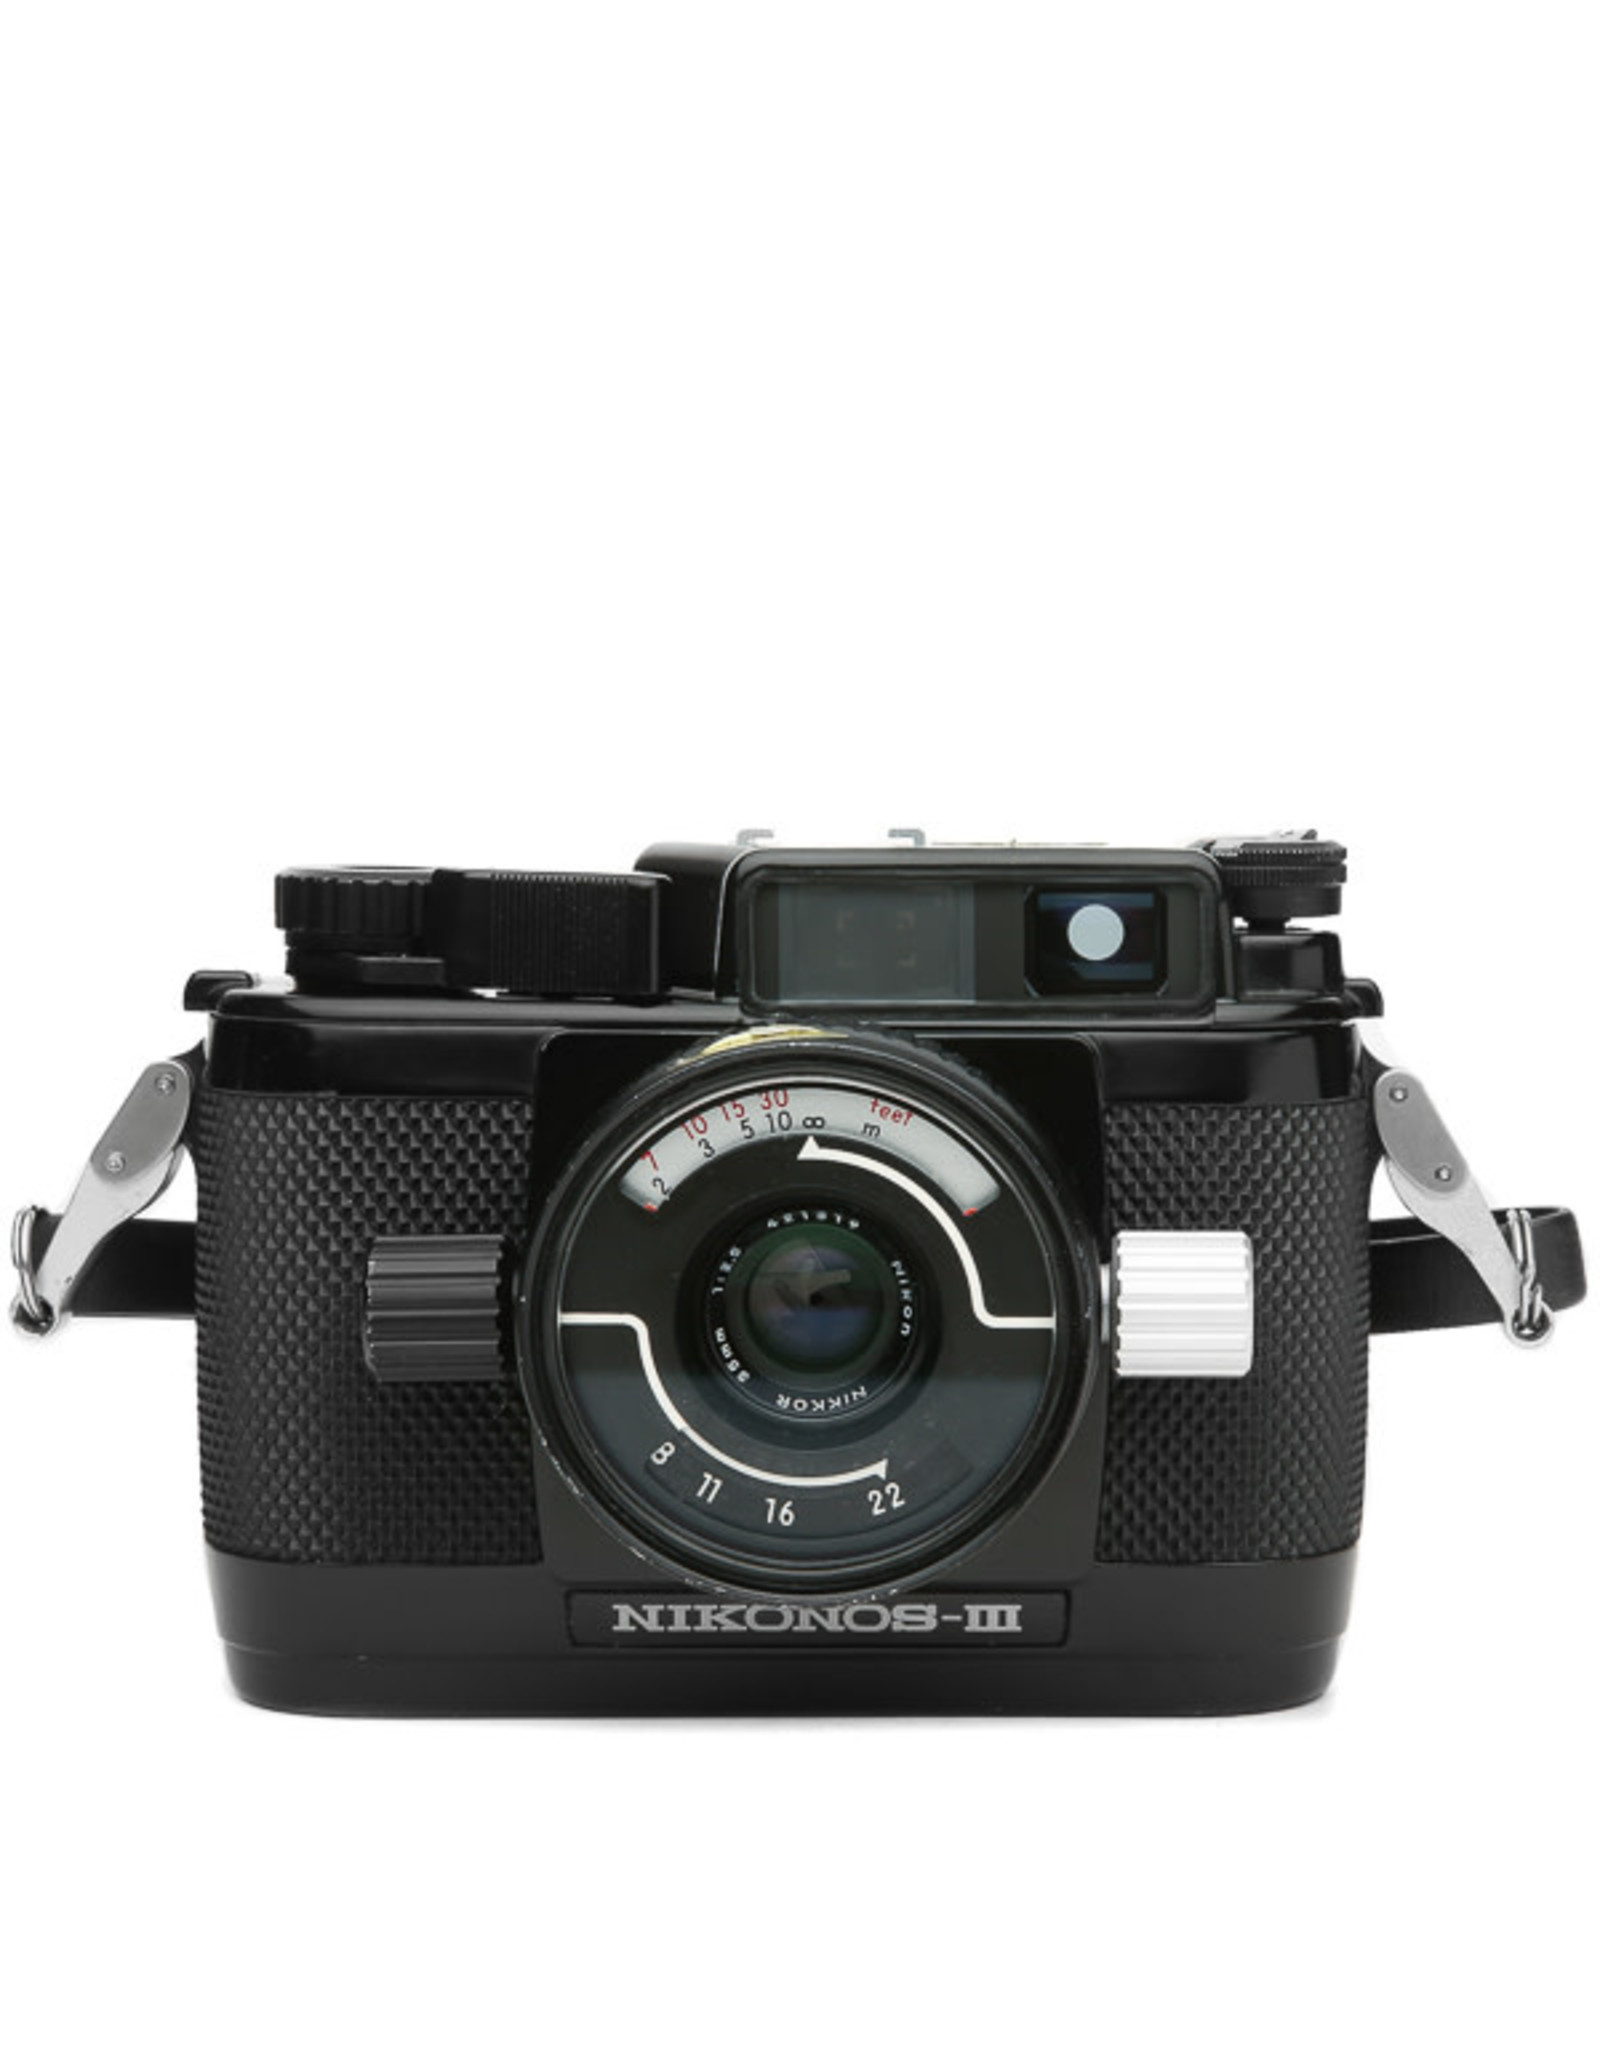 Nikon Nikon Nikonos III Underwater Camera w/35mm f2.8